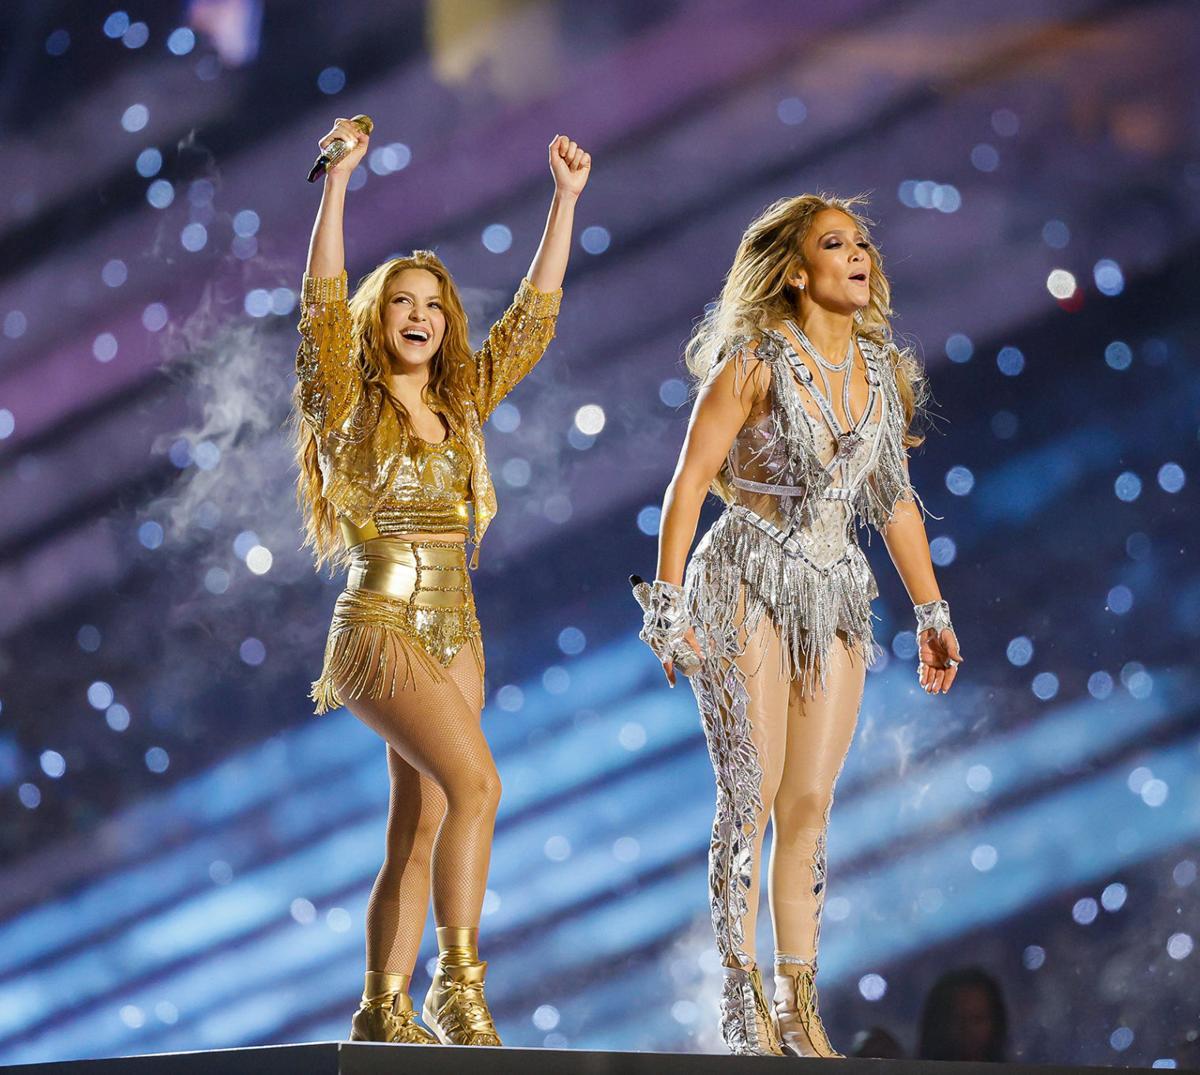 Shakira and Jennifer Lopez perform during the Pepsi Super Bowl LIV Halftime Show at Hard Rock Stadium in Miami Gardens, Fla., on Sunday, Feb. 2, 2020.